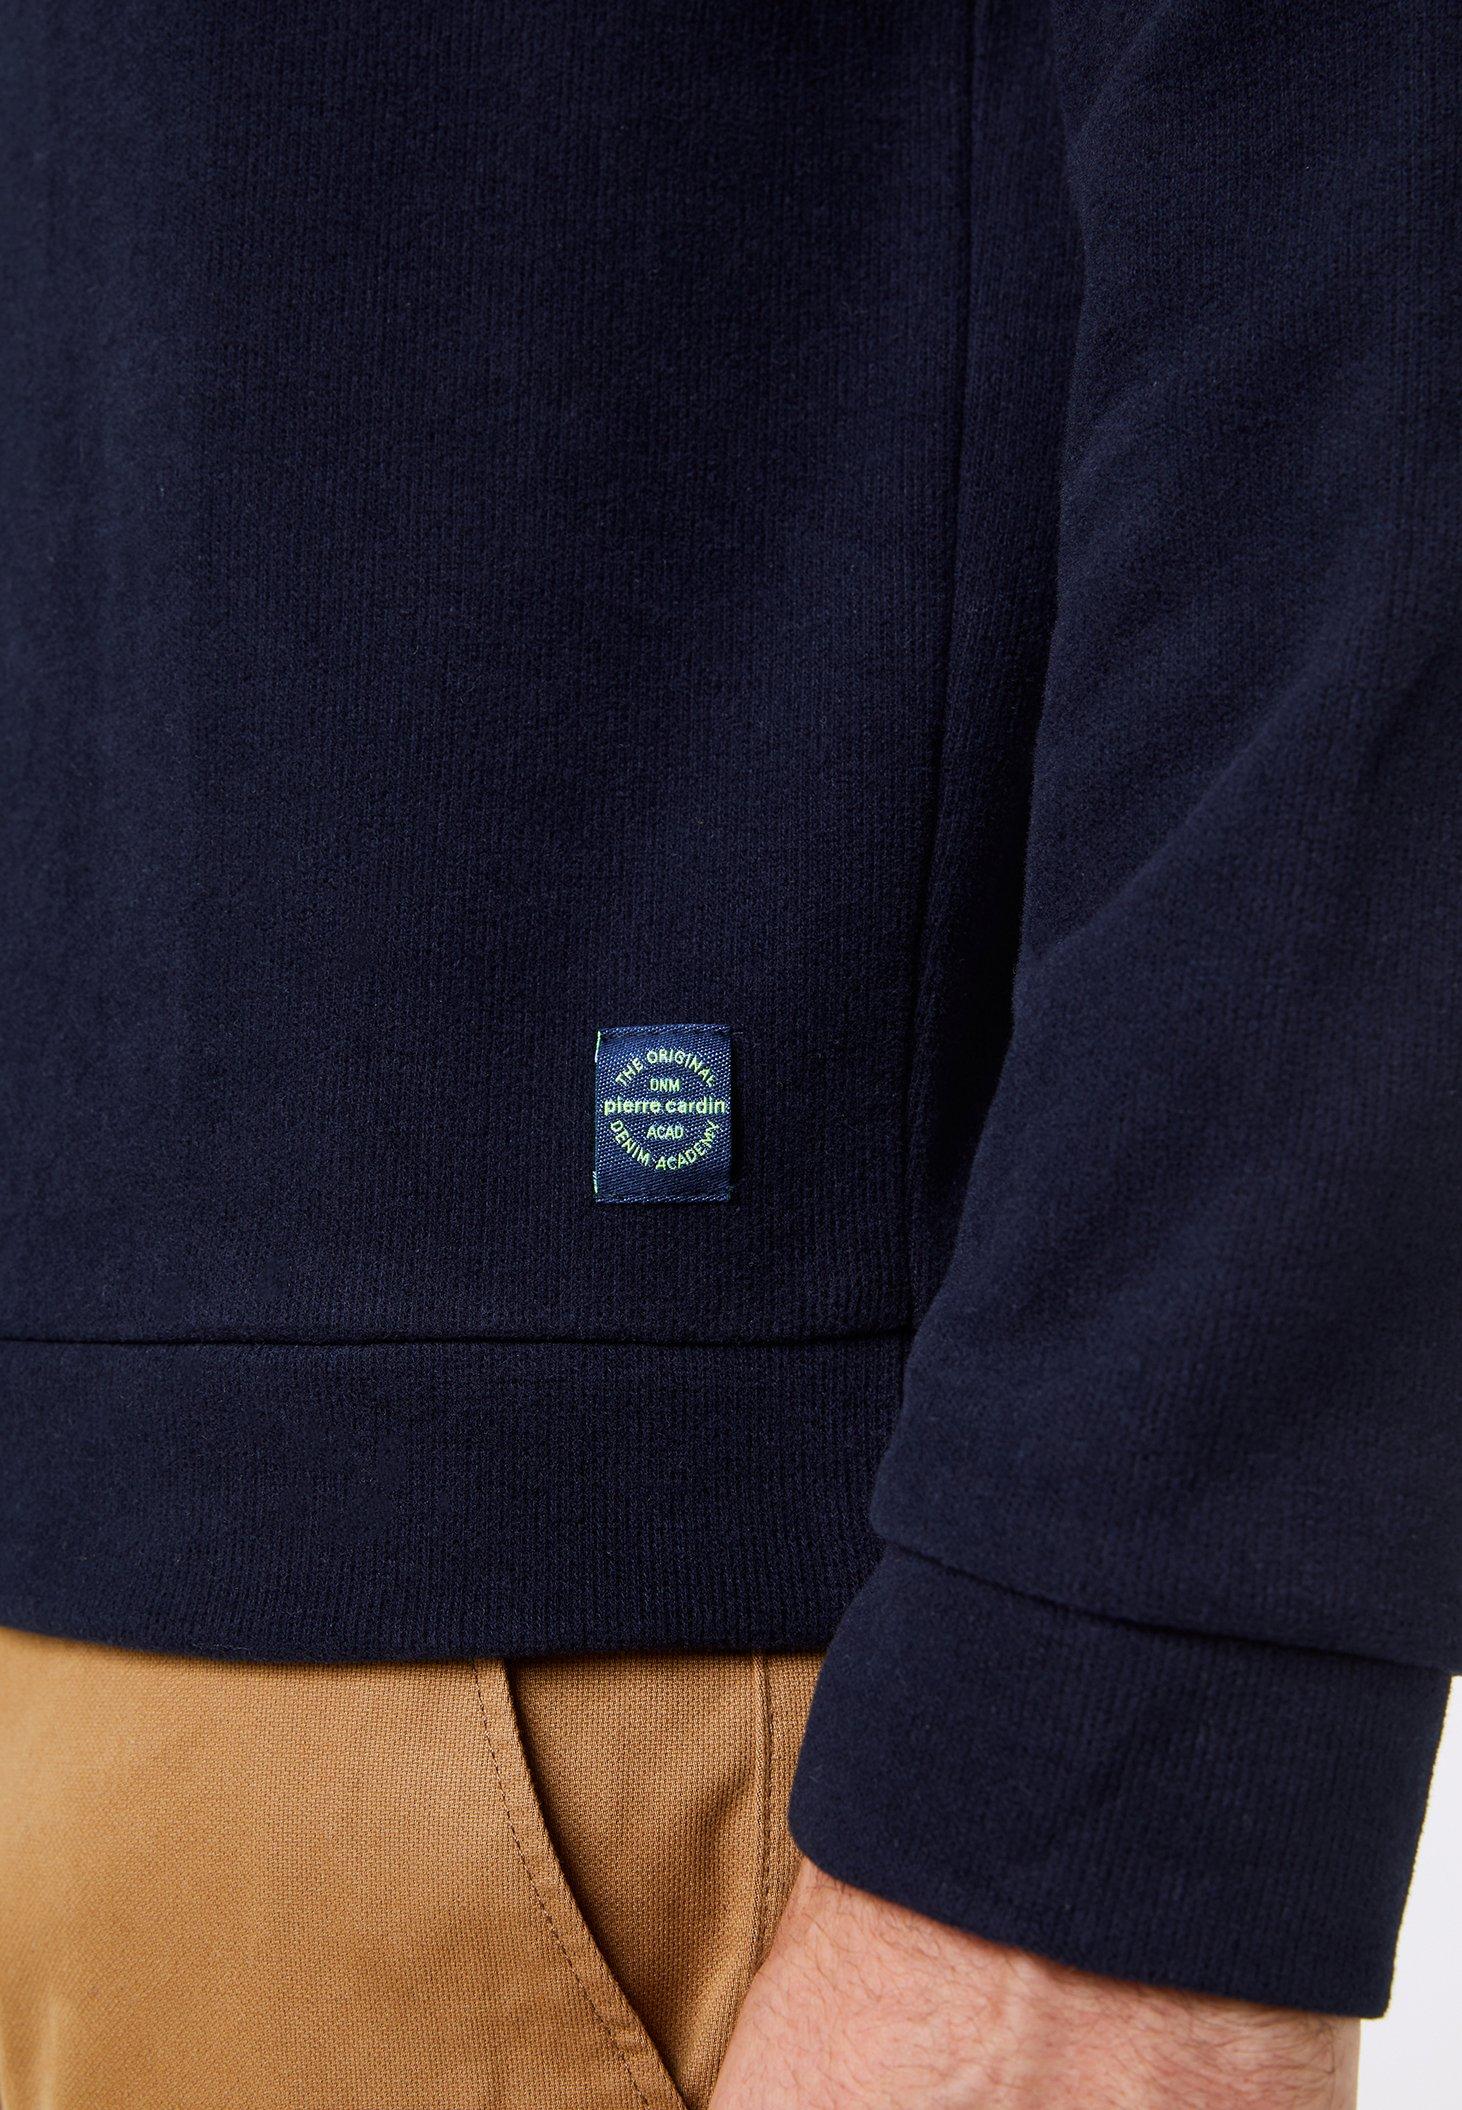 Pierre Cardin Sweatshirt dark blue